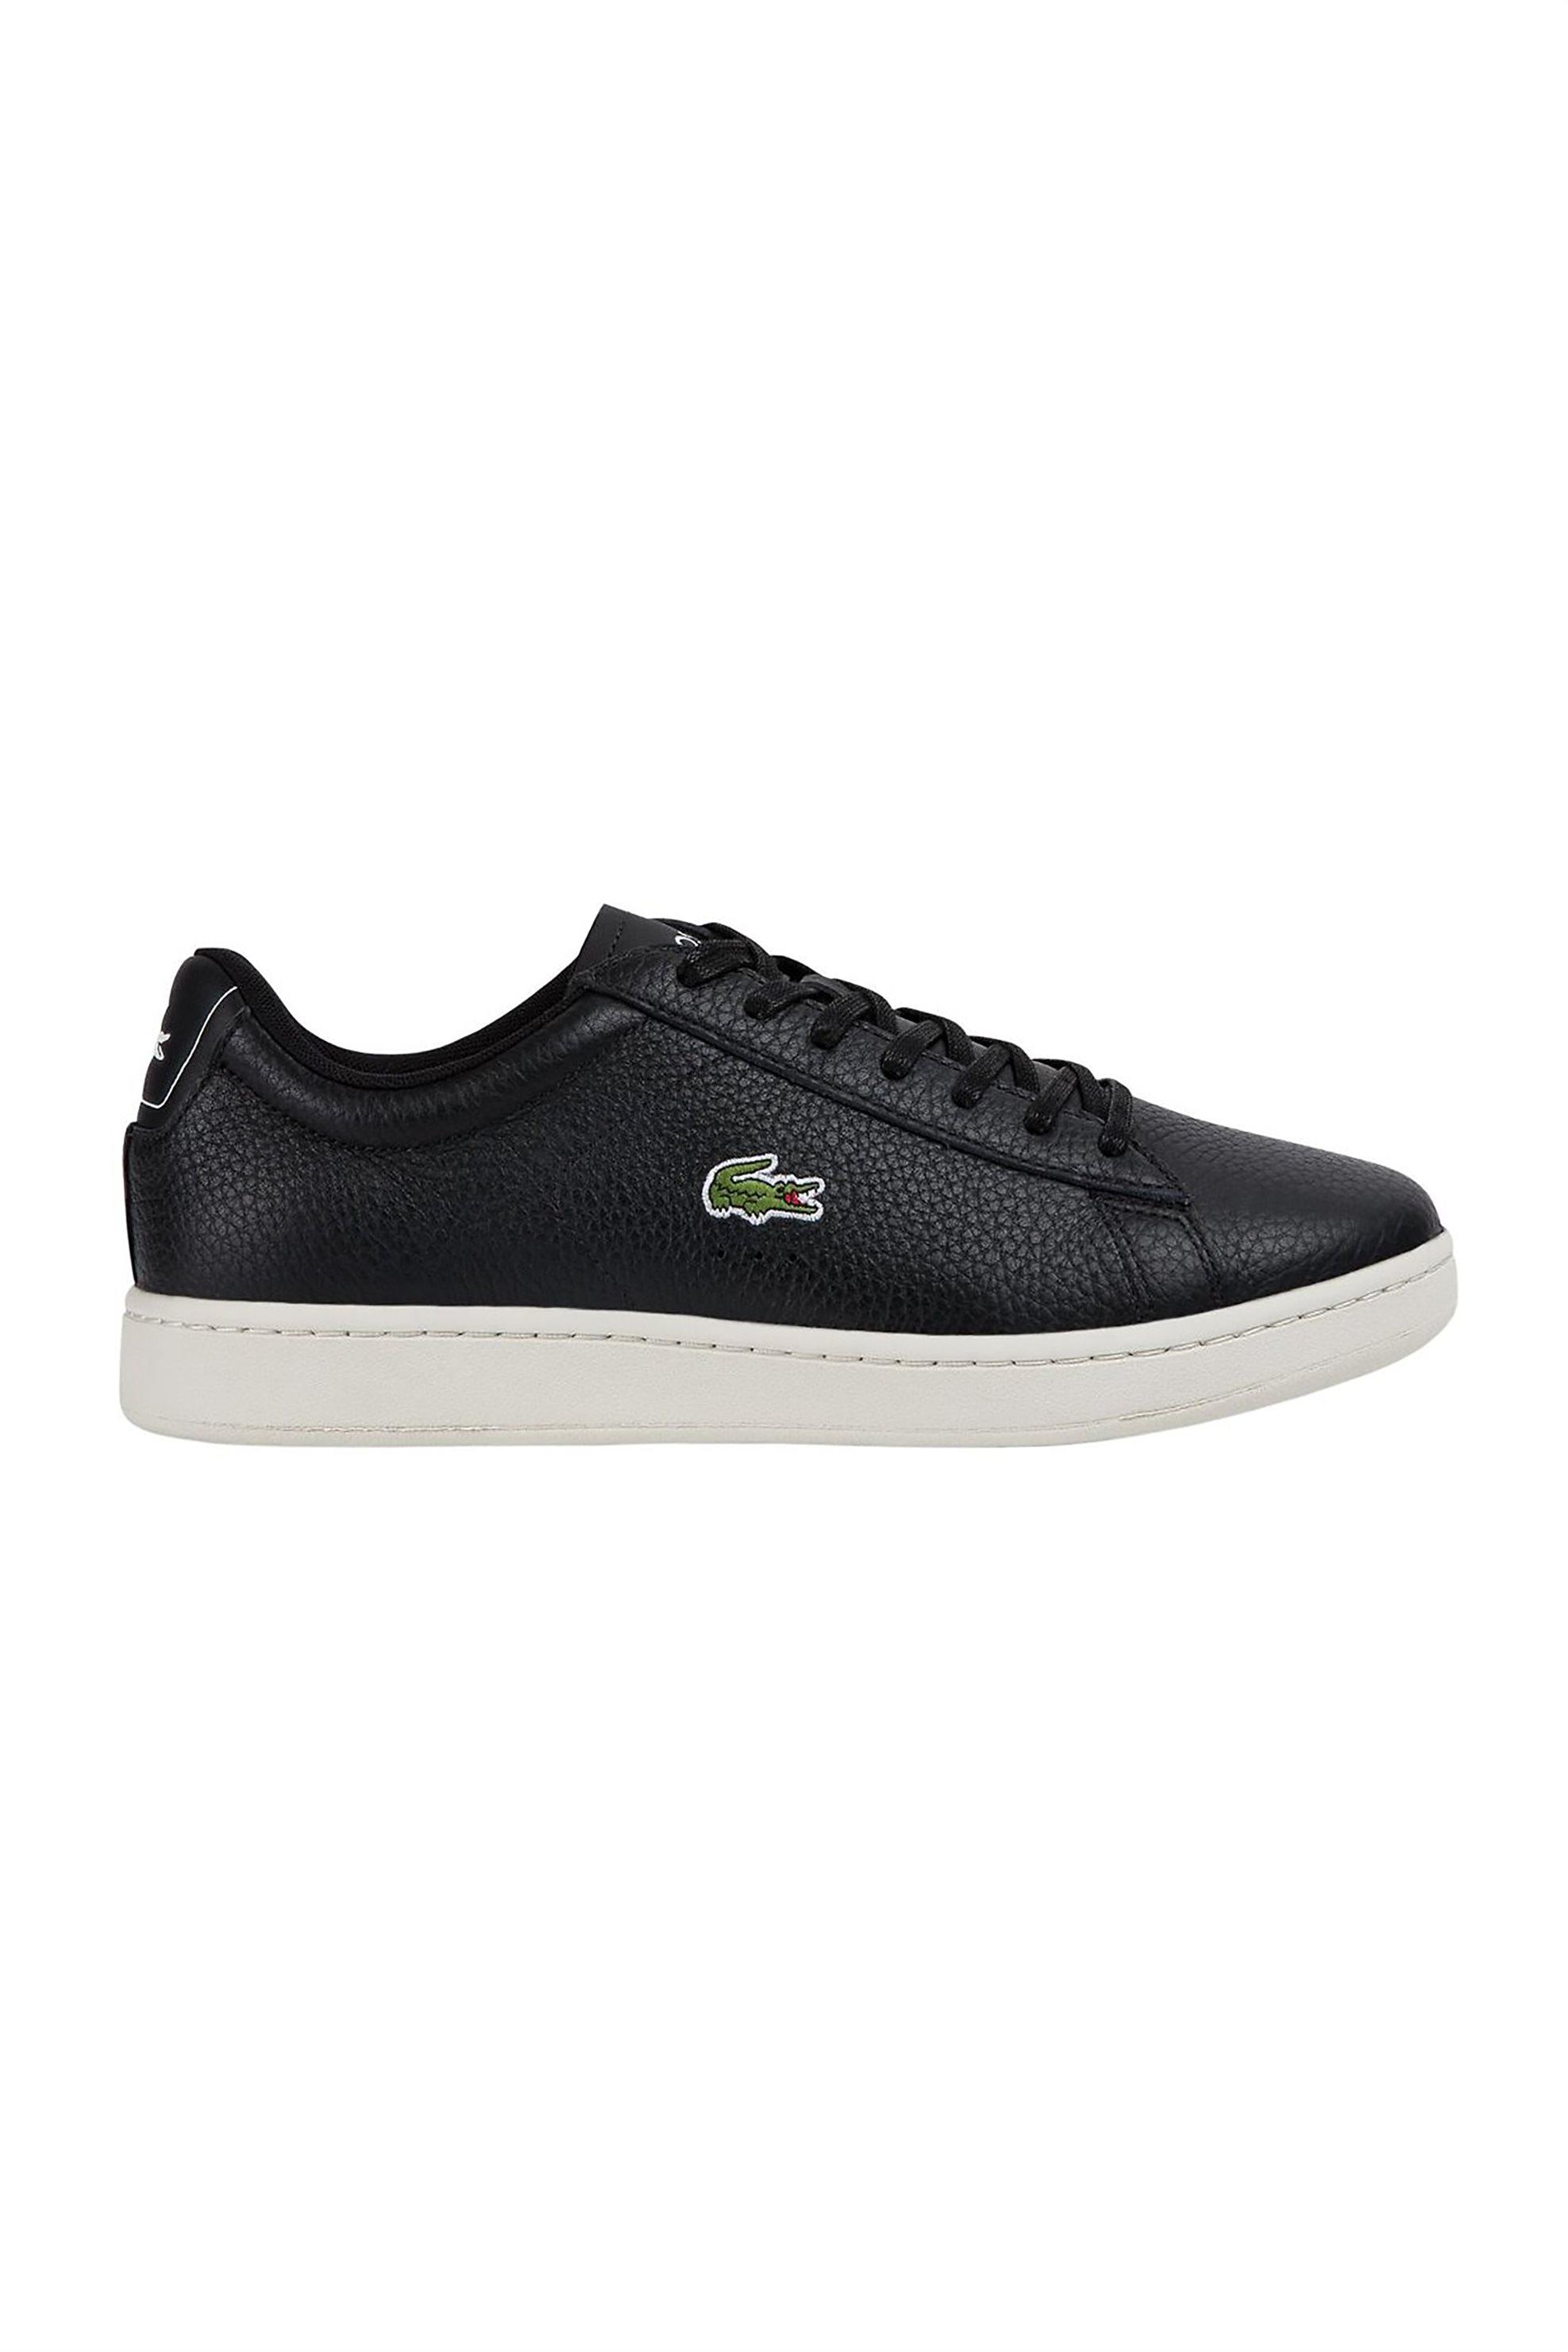 "Lacoste ανδρικα sneakers με κορδόνια ""Carnaby Evo 0120 2"" – 40SMA0015454 – Μαύρο"